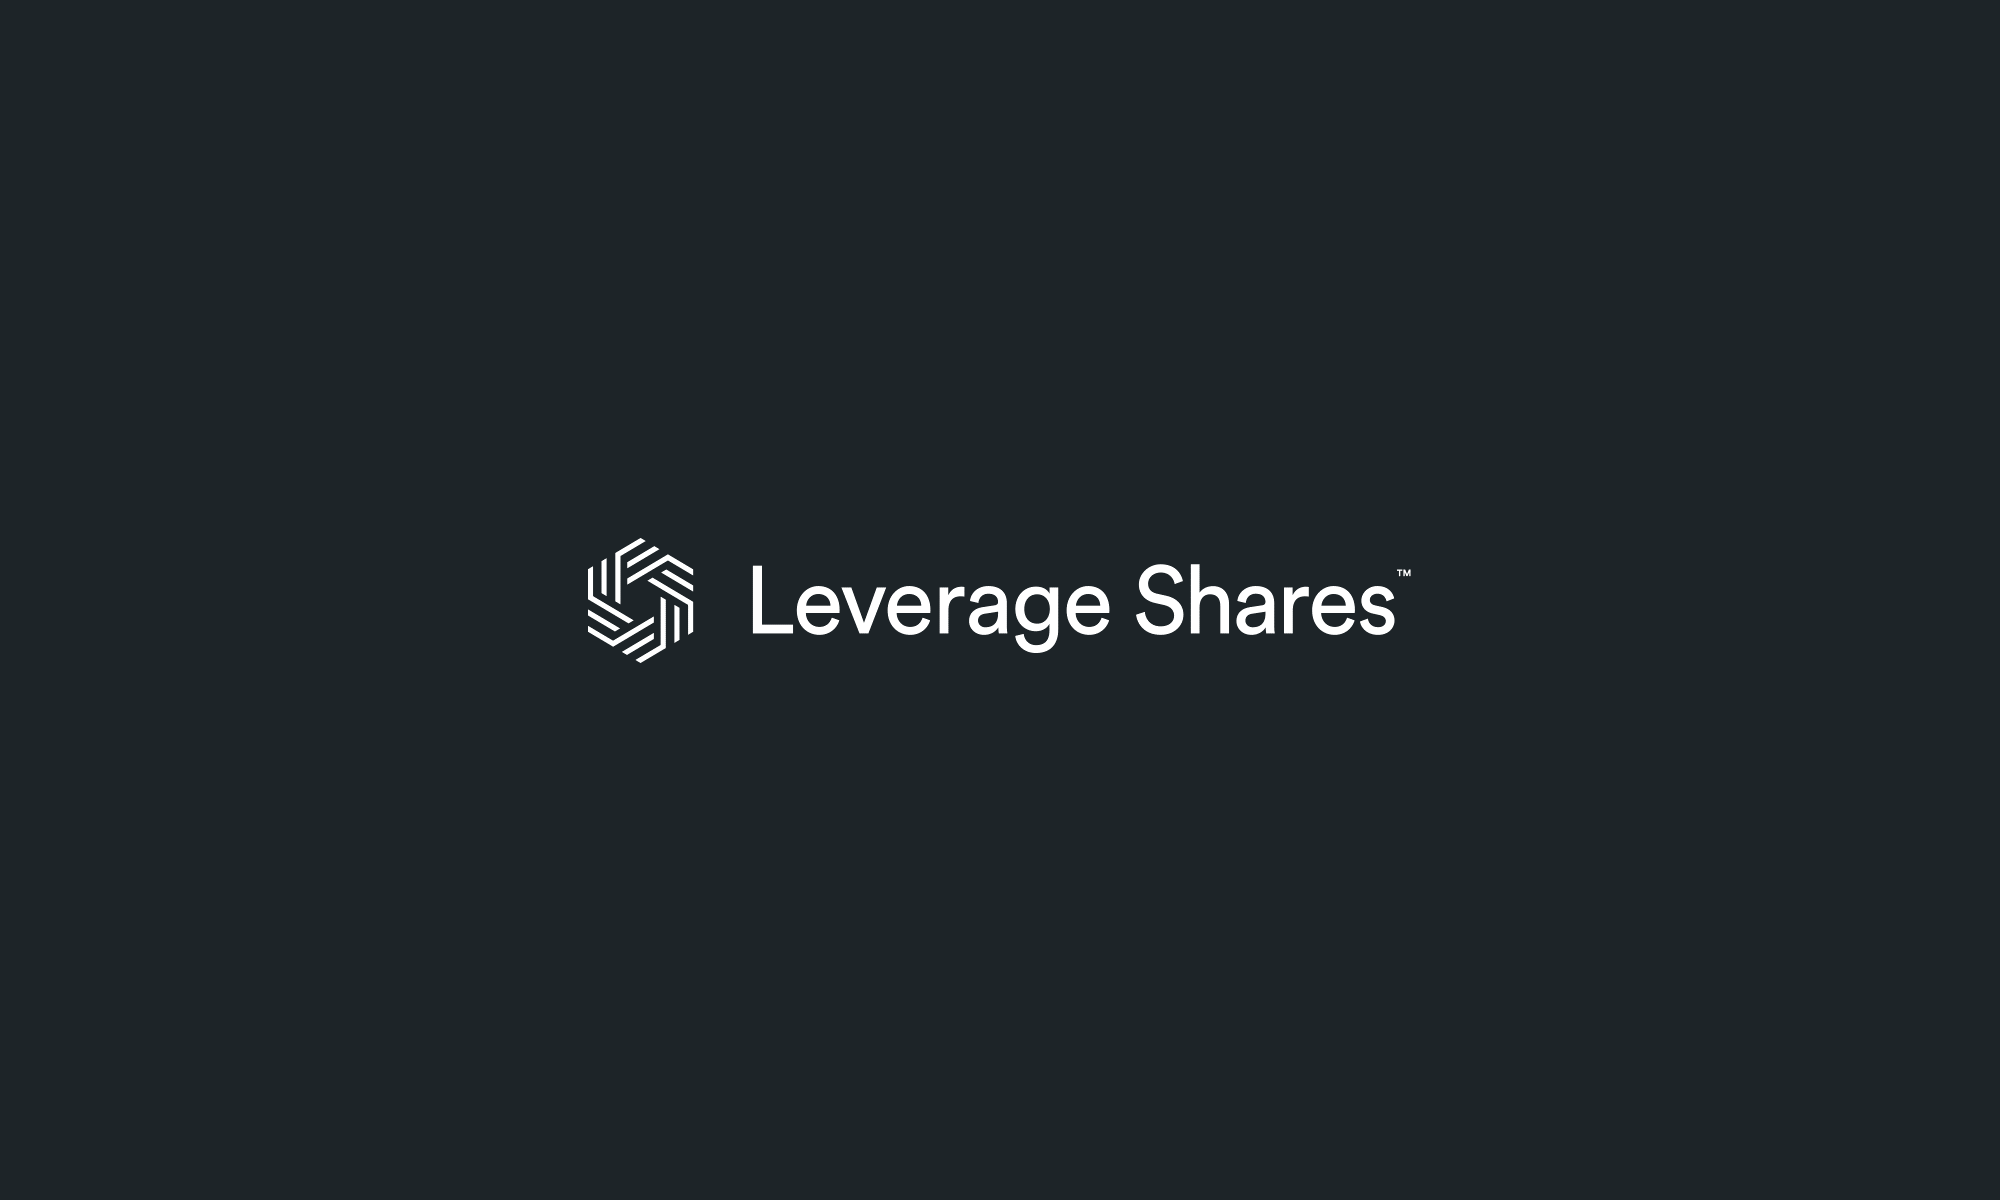 Intervju med Oktay Kavrak, produktstrateg på Leverage Shares